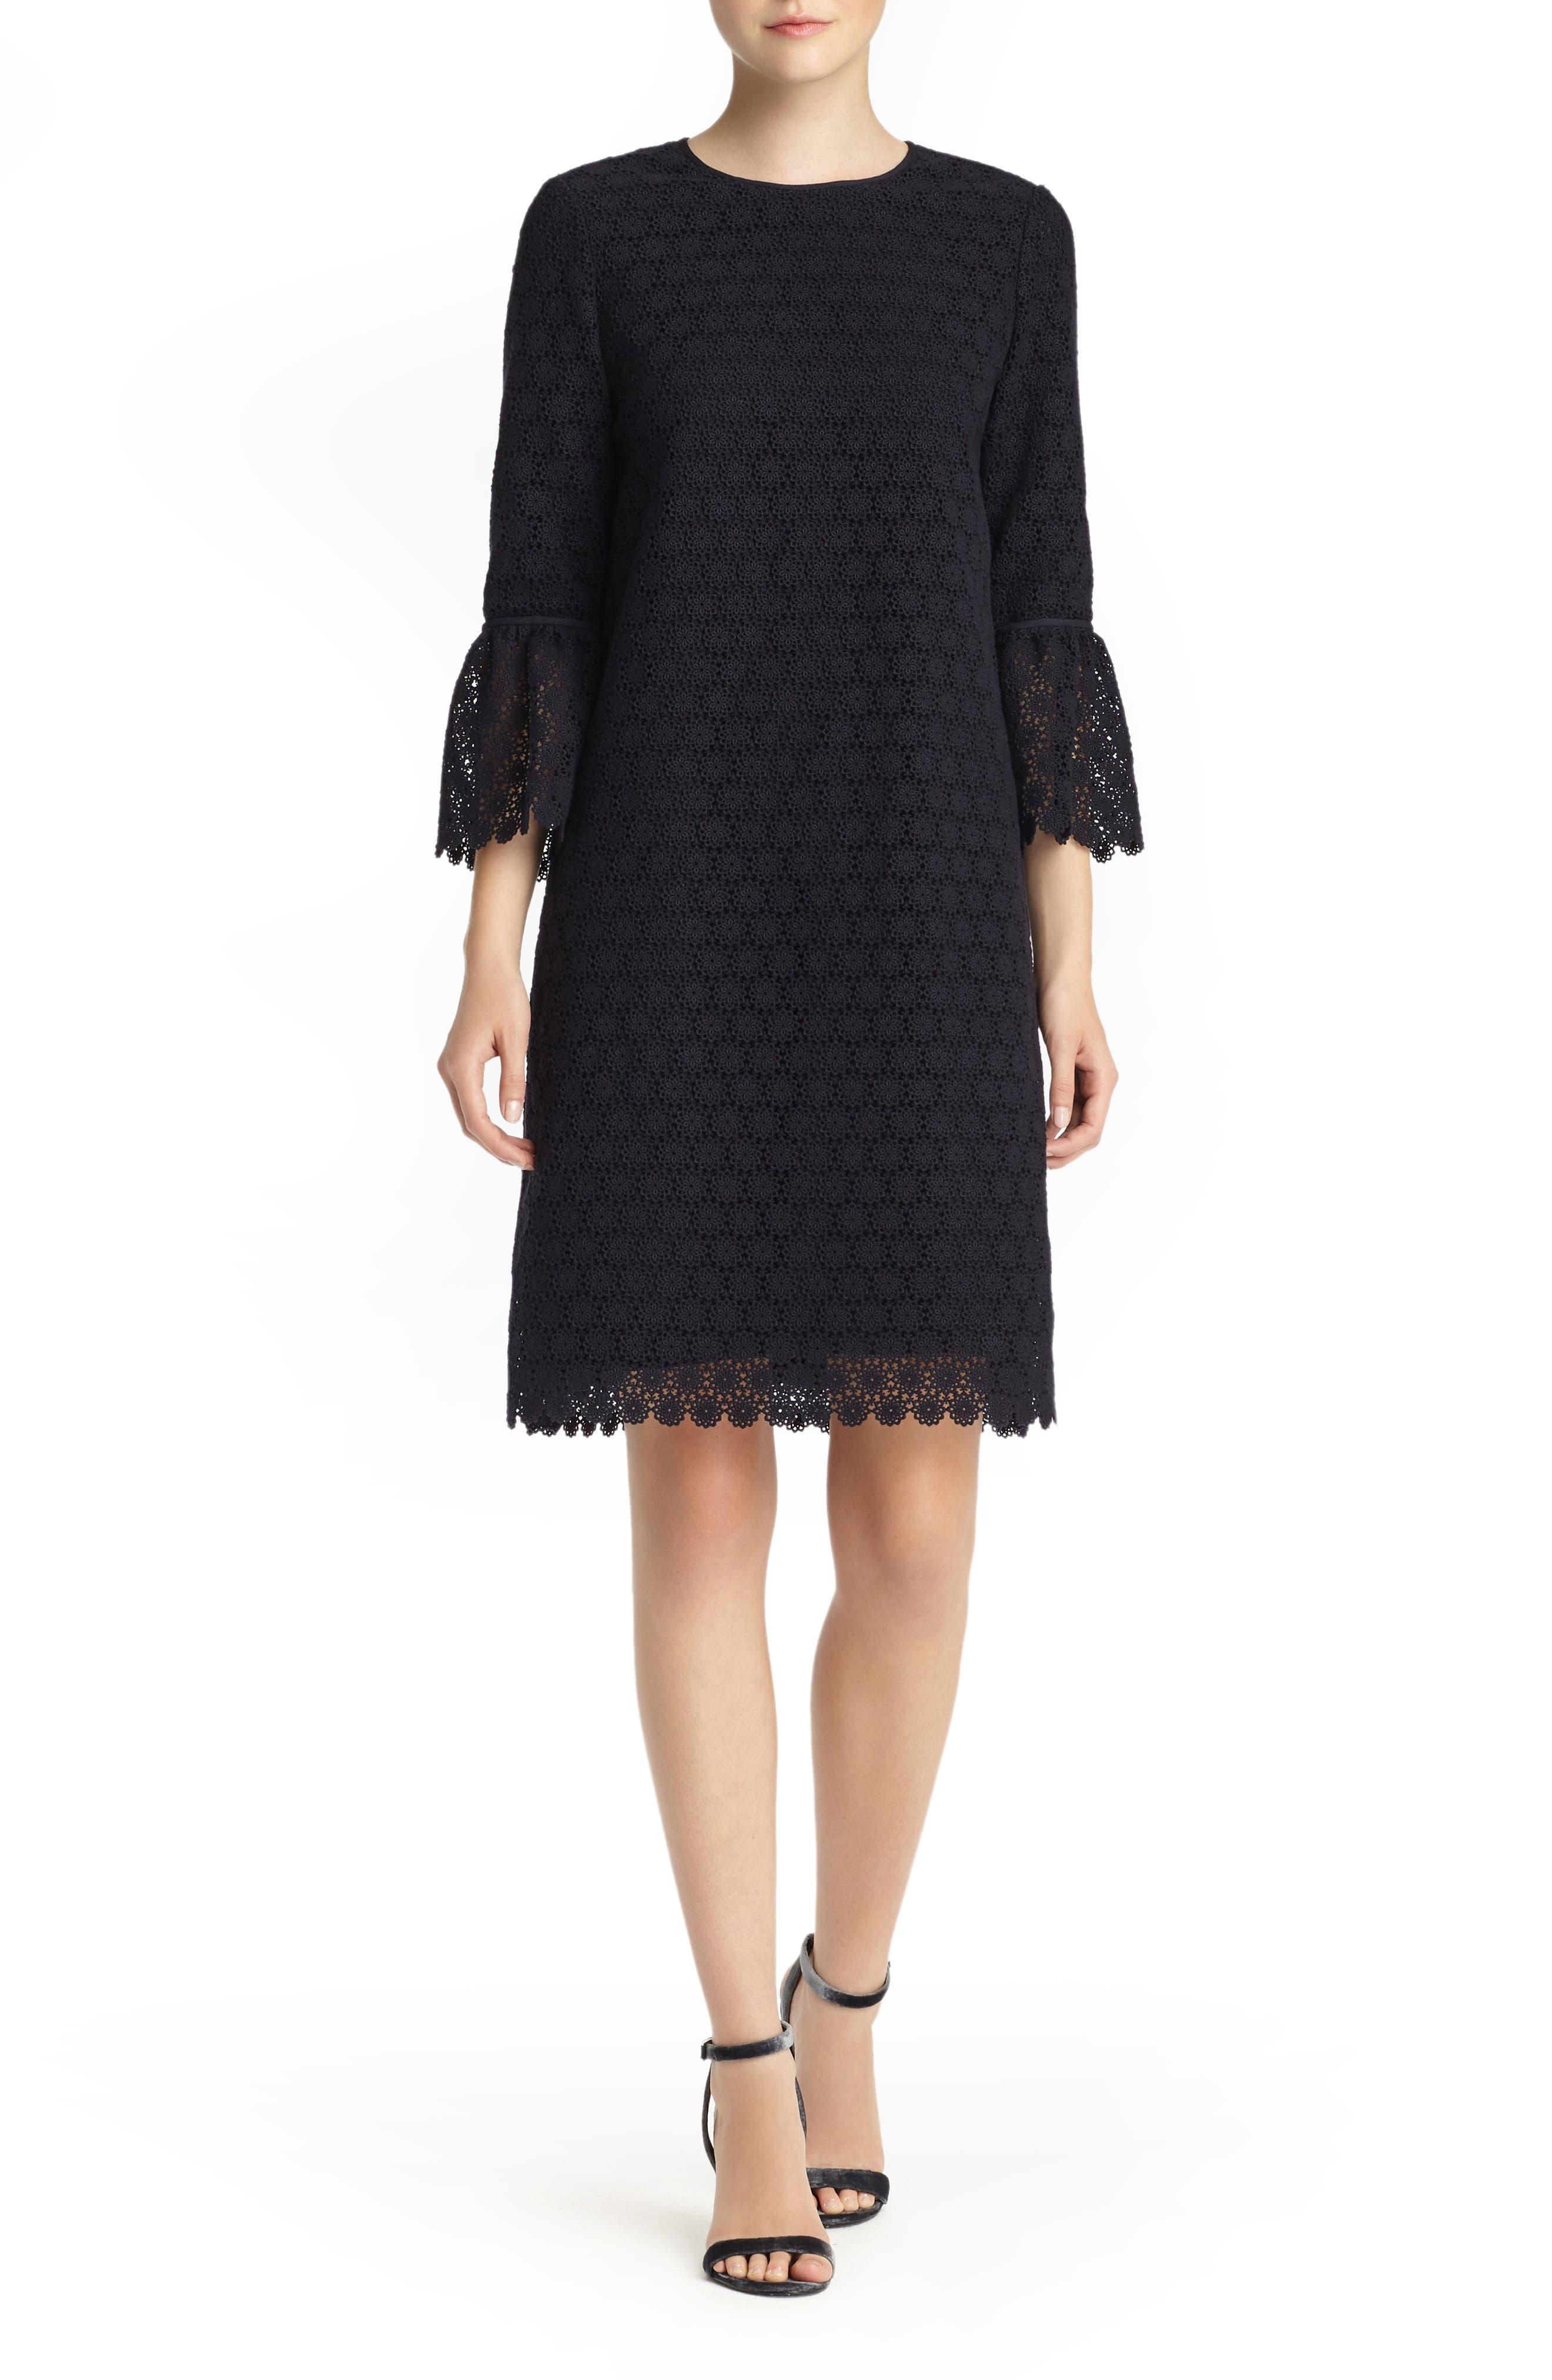 Lafayette 148 New York Sidra Bell Sleeve Lace Dress